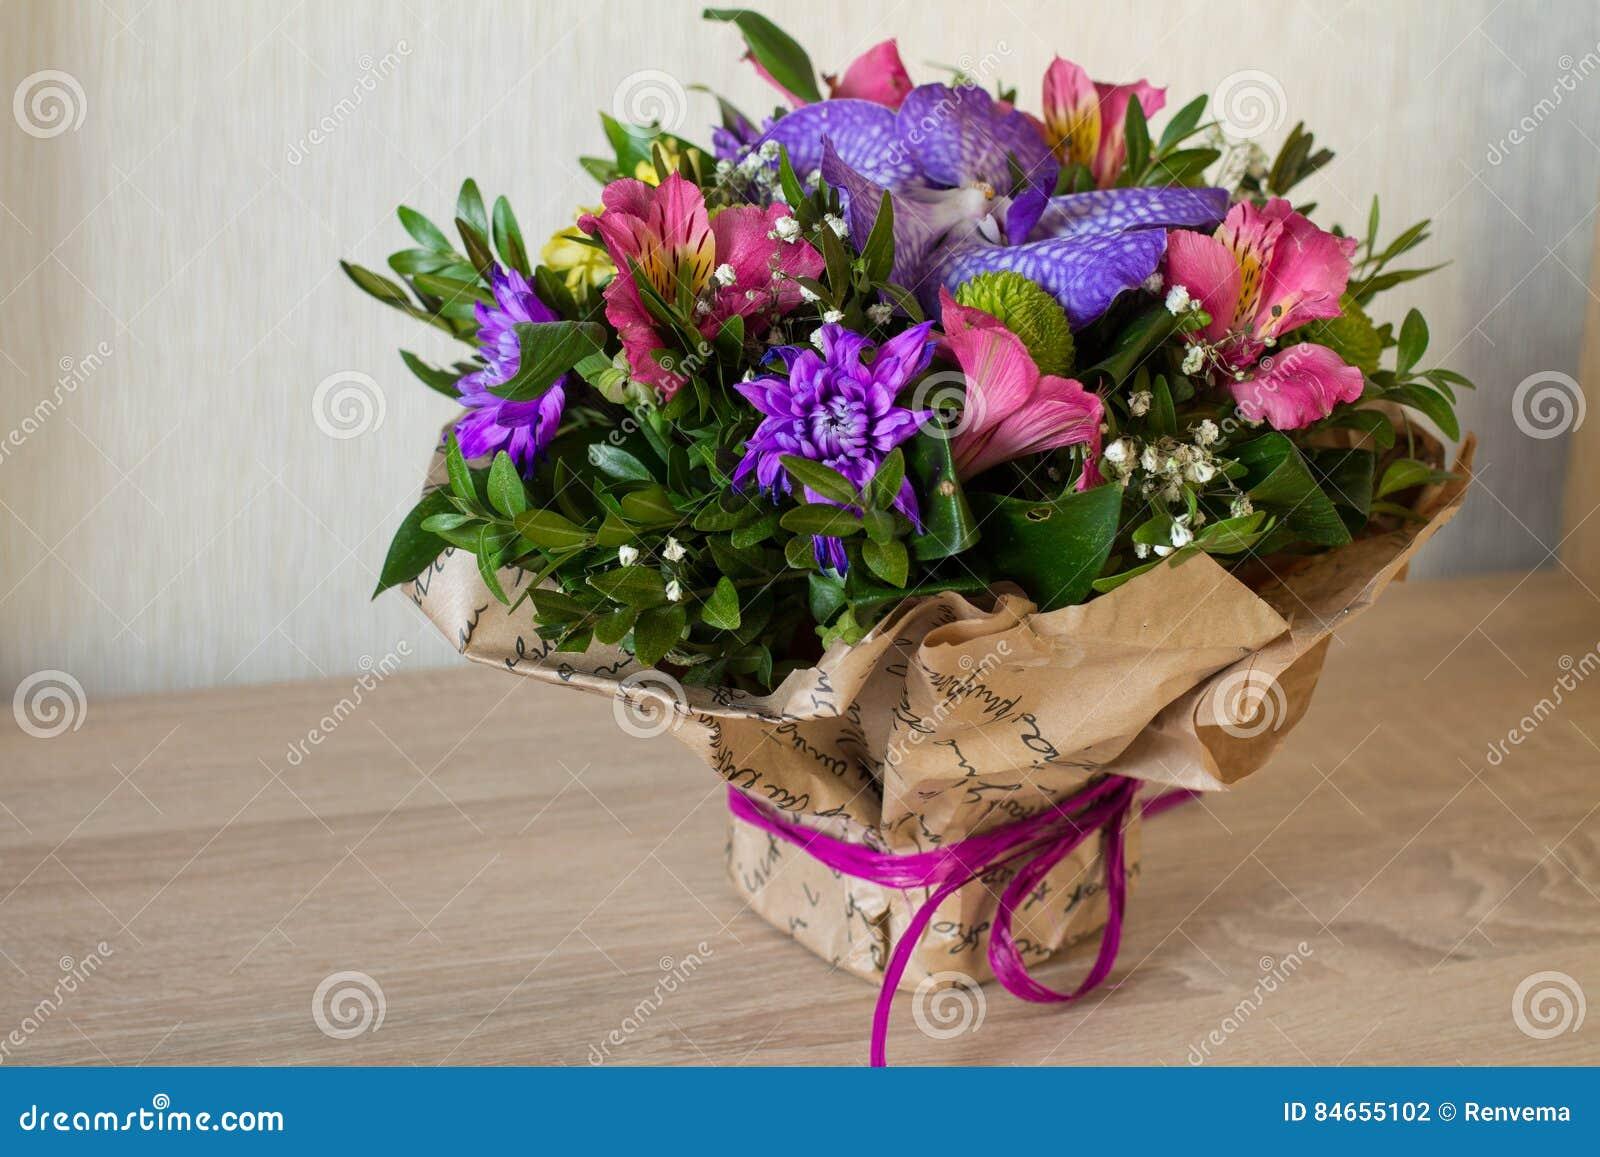 Bouquet Of Flowers Purple Orchid Alstroemeria Green Chrysanthemum